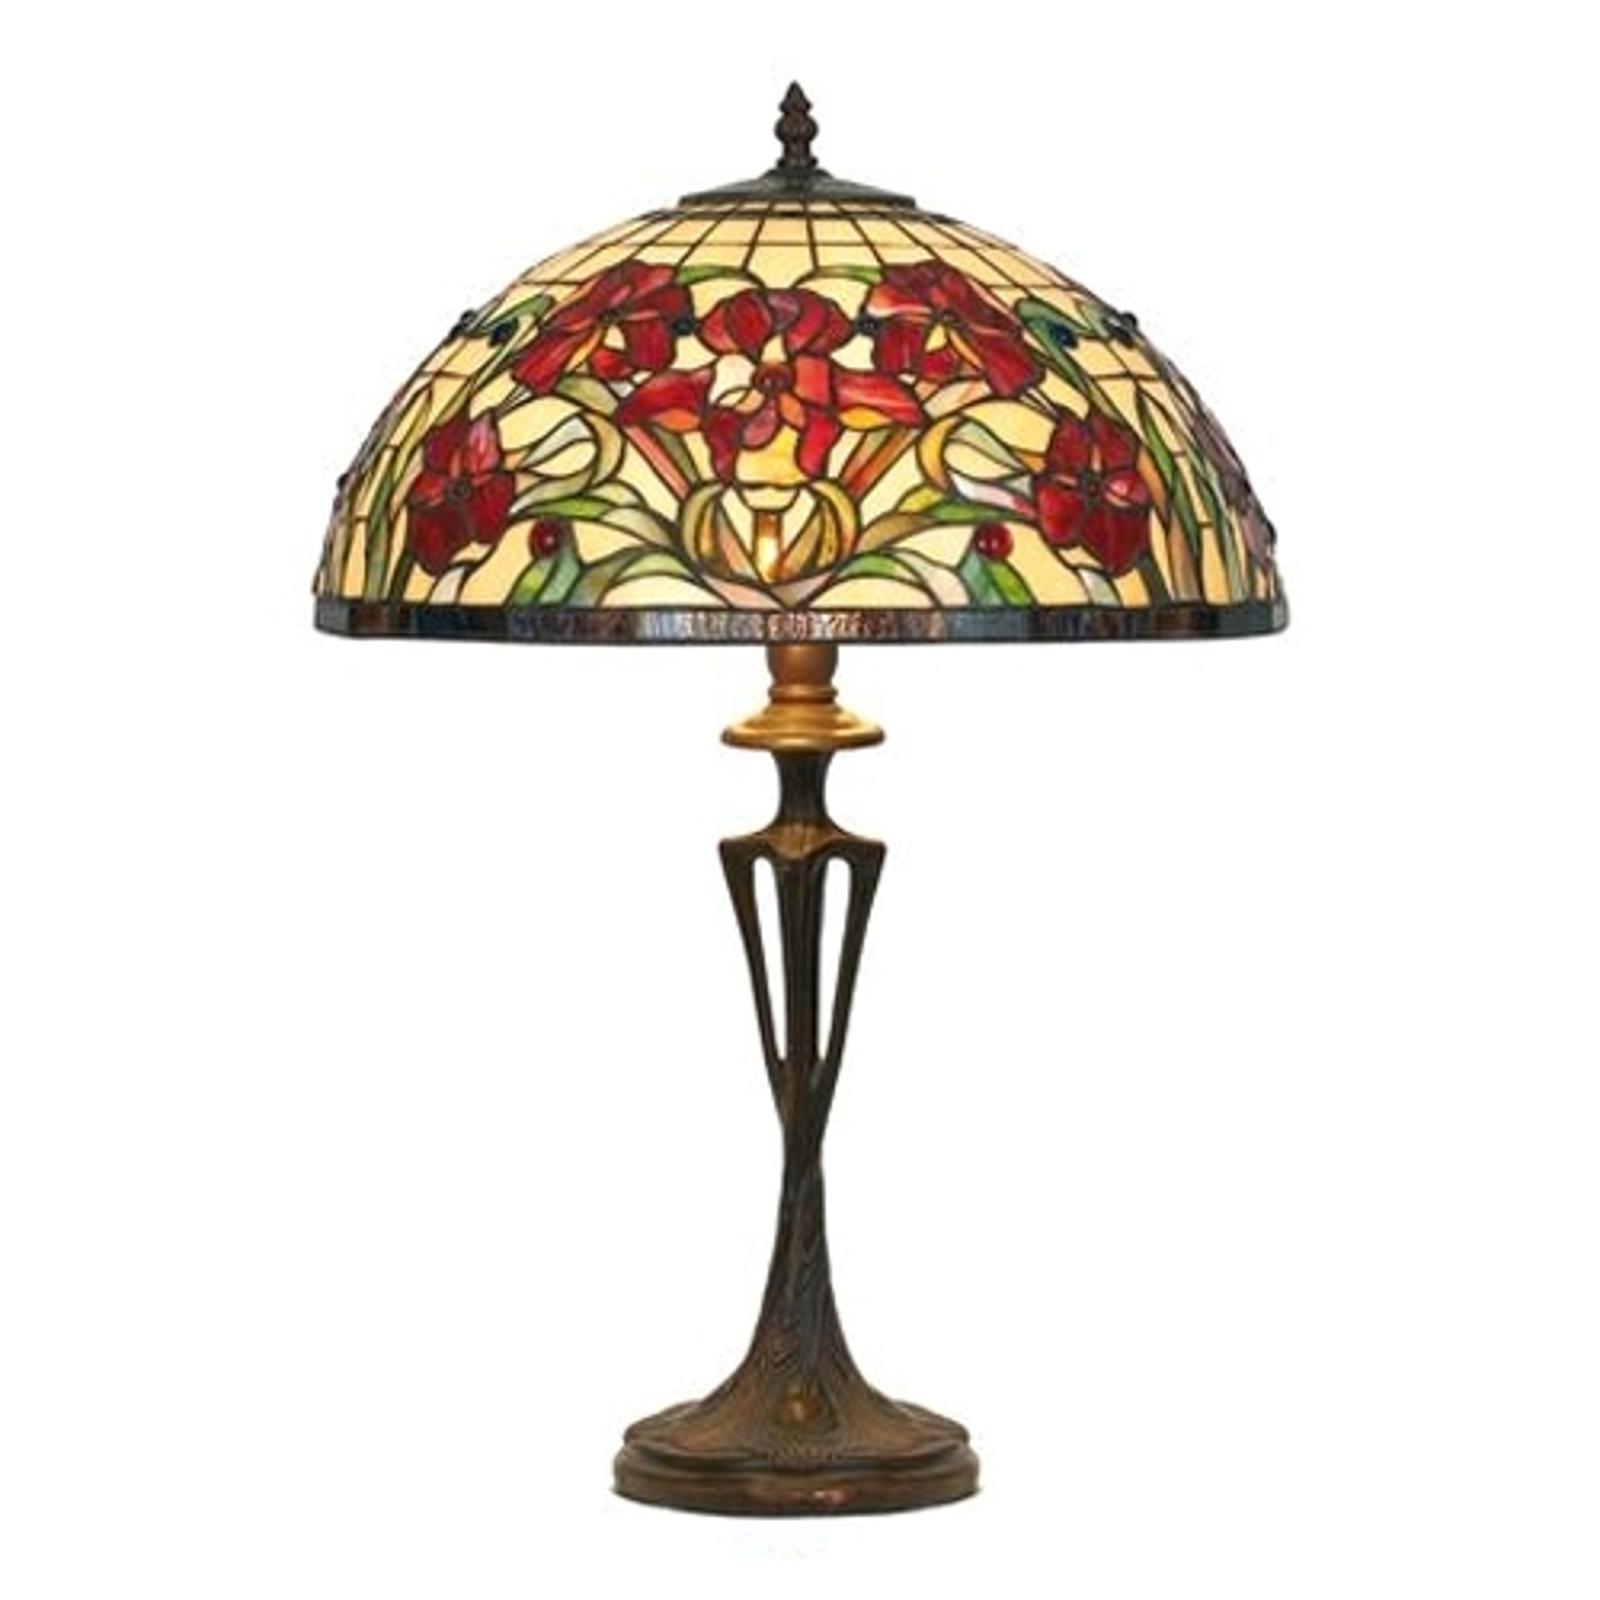 Bordslampa Eline i Tiffany-stil